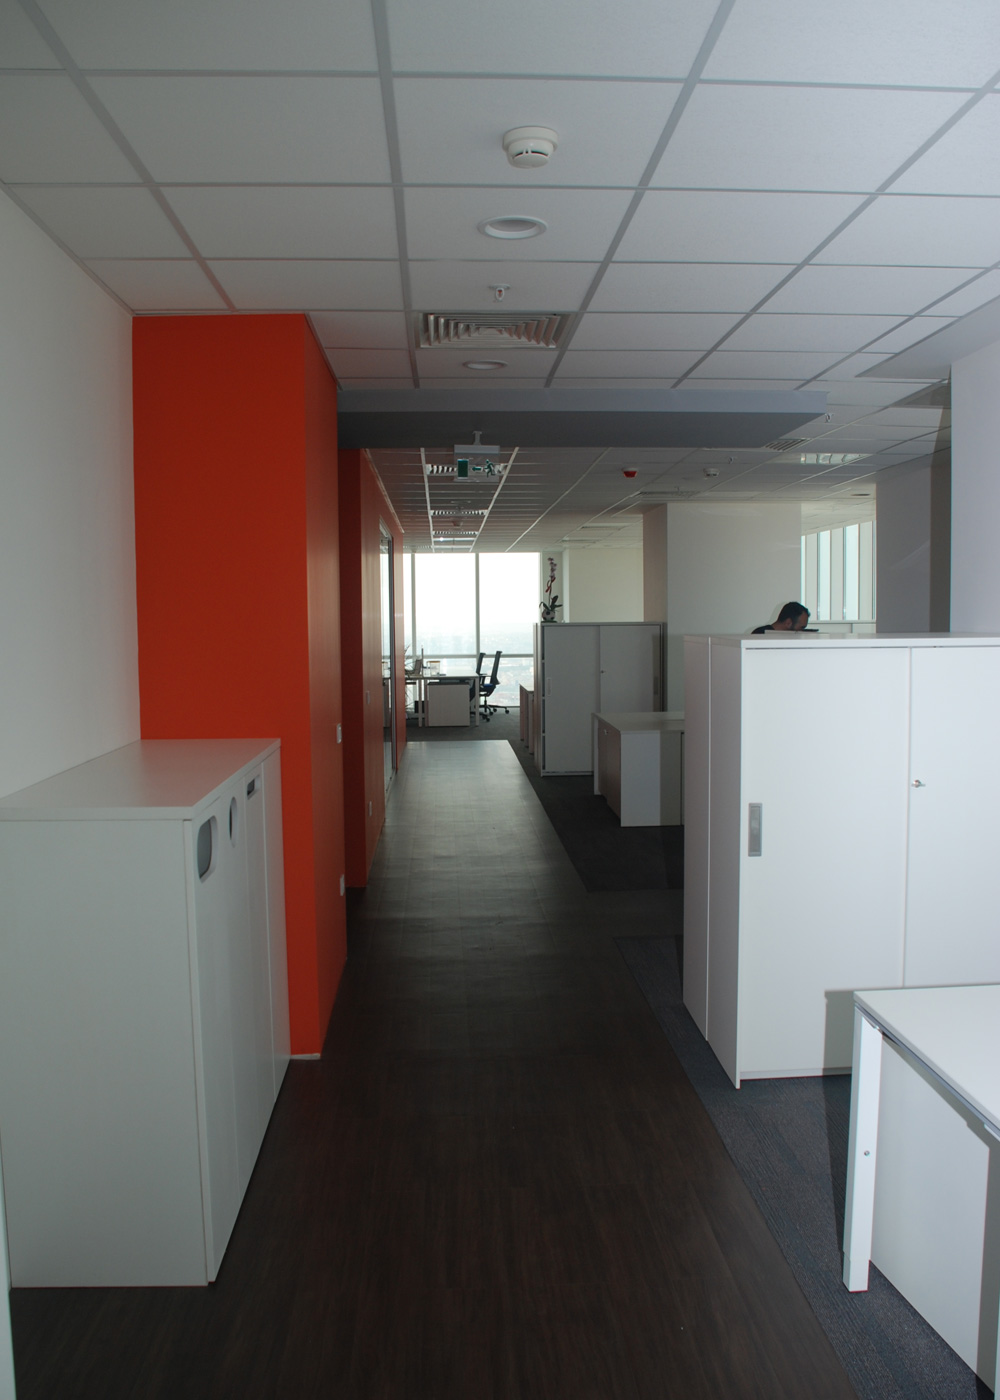 Design office ofis tasarimi dll trump 2013 6 design for Office design 2013